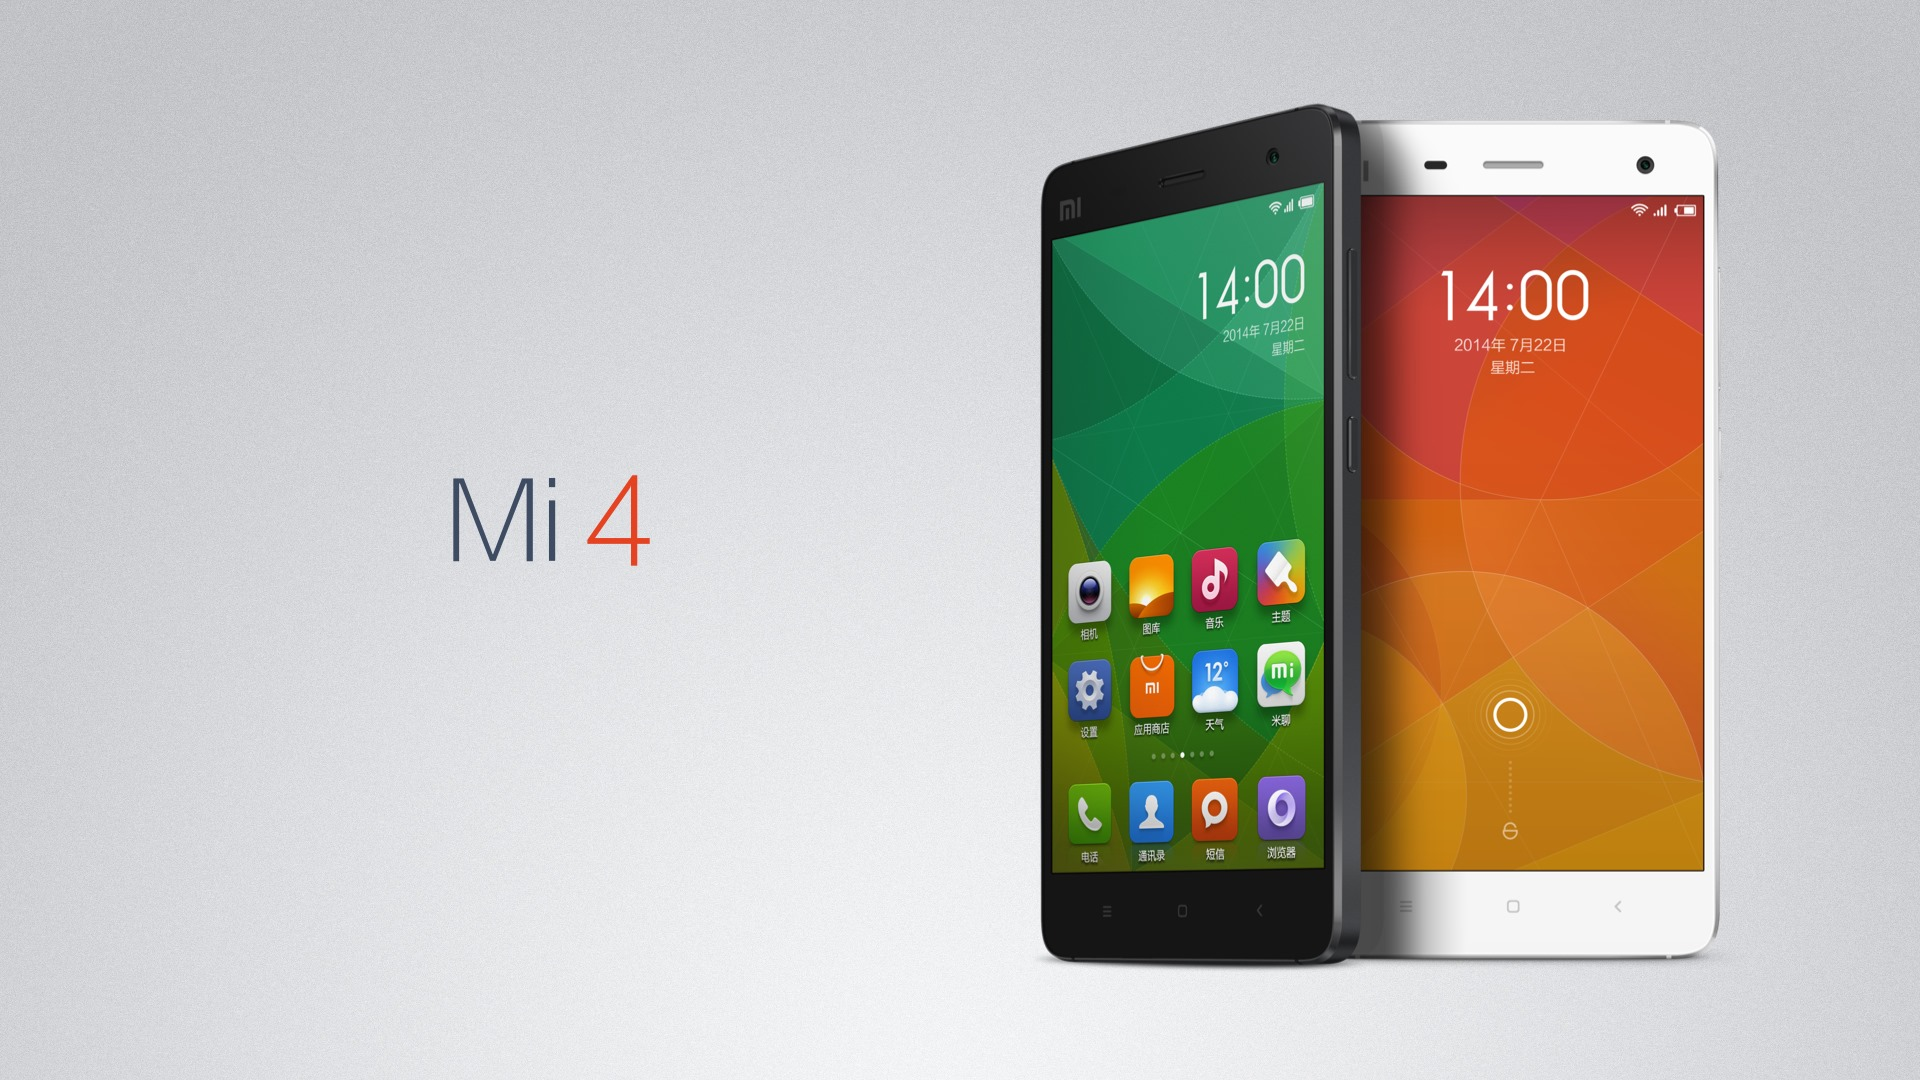 Xiaomi Redmi Note 4 To Ship With Dual Camera 3g